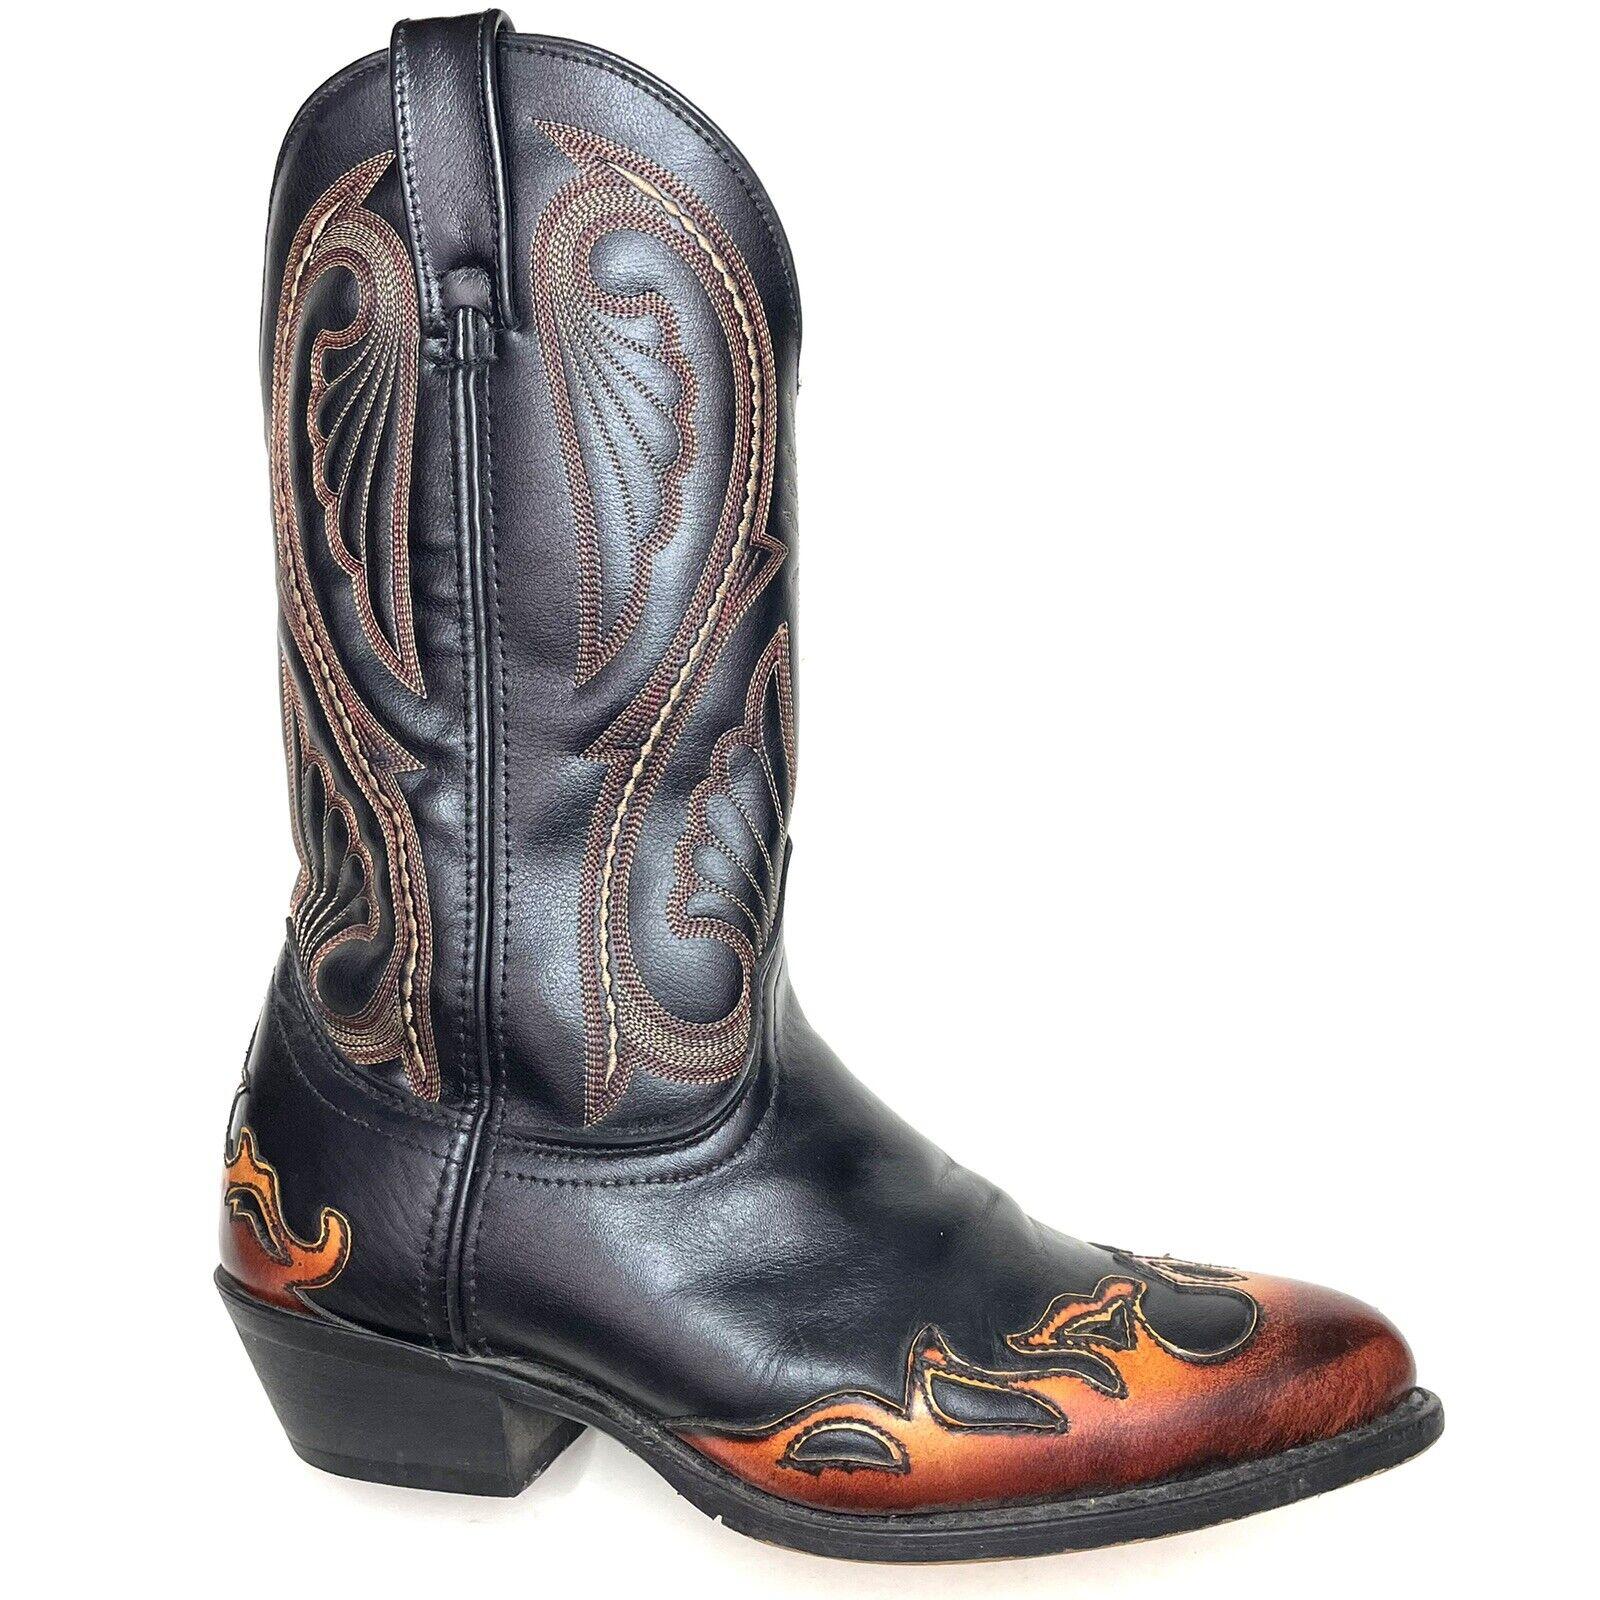 Laredo Mens Cowboy Western Boots Mignon Flames Fire Wingtip Black 2754 Sz 9.5 D